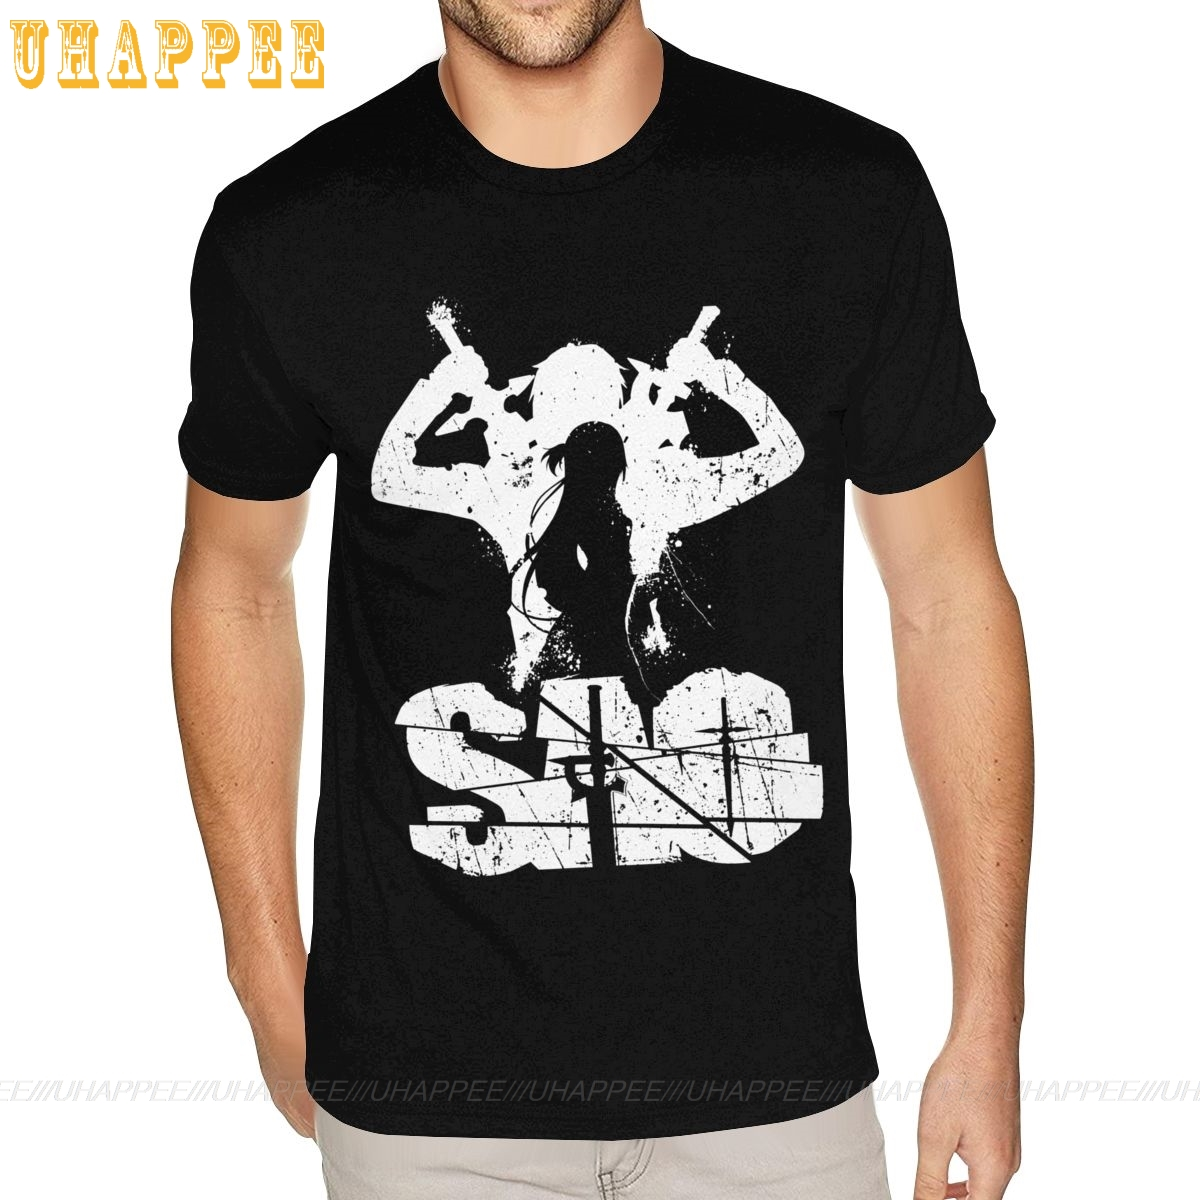 Yellow Sword Art Online Tee Men's 3XL Short Sleeved Black Crew T Shirt